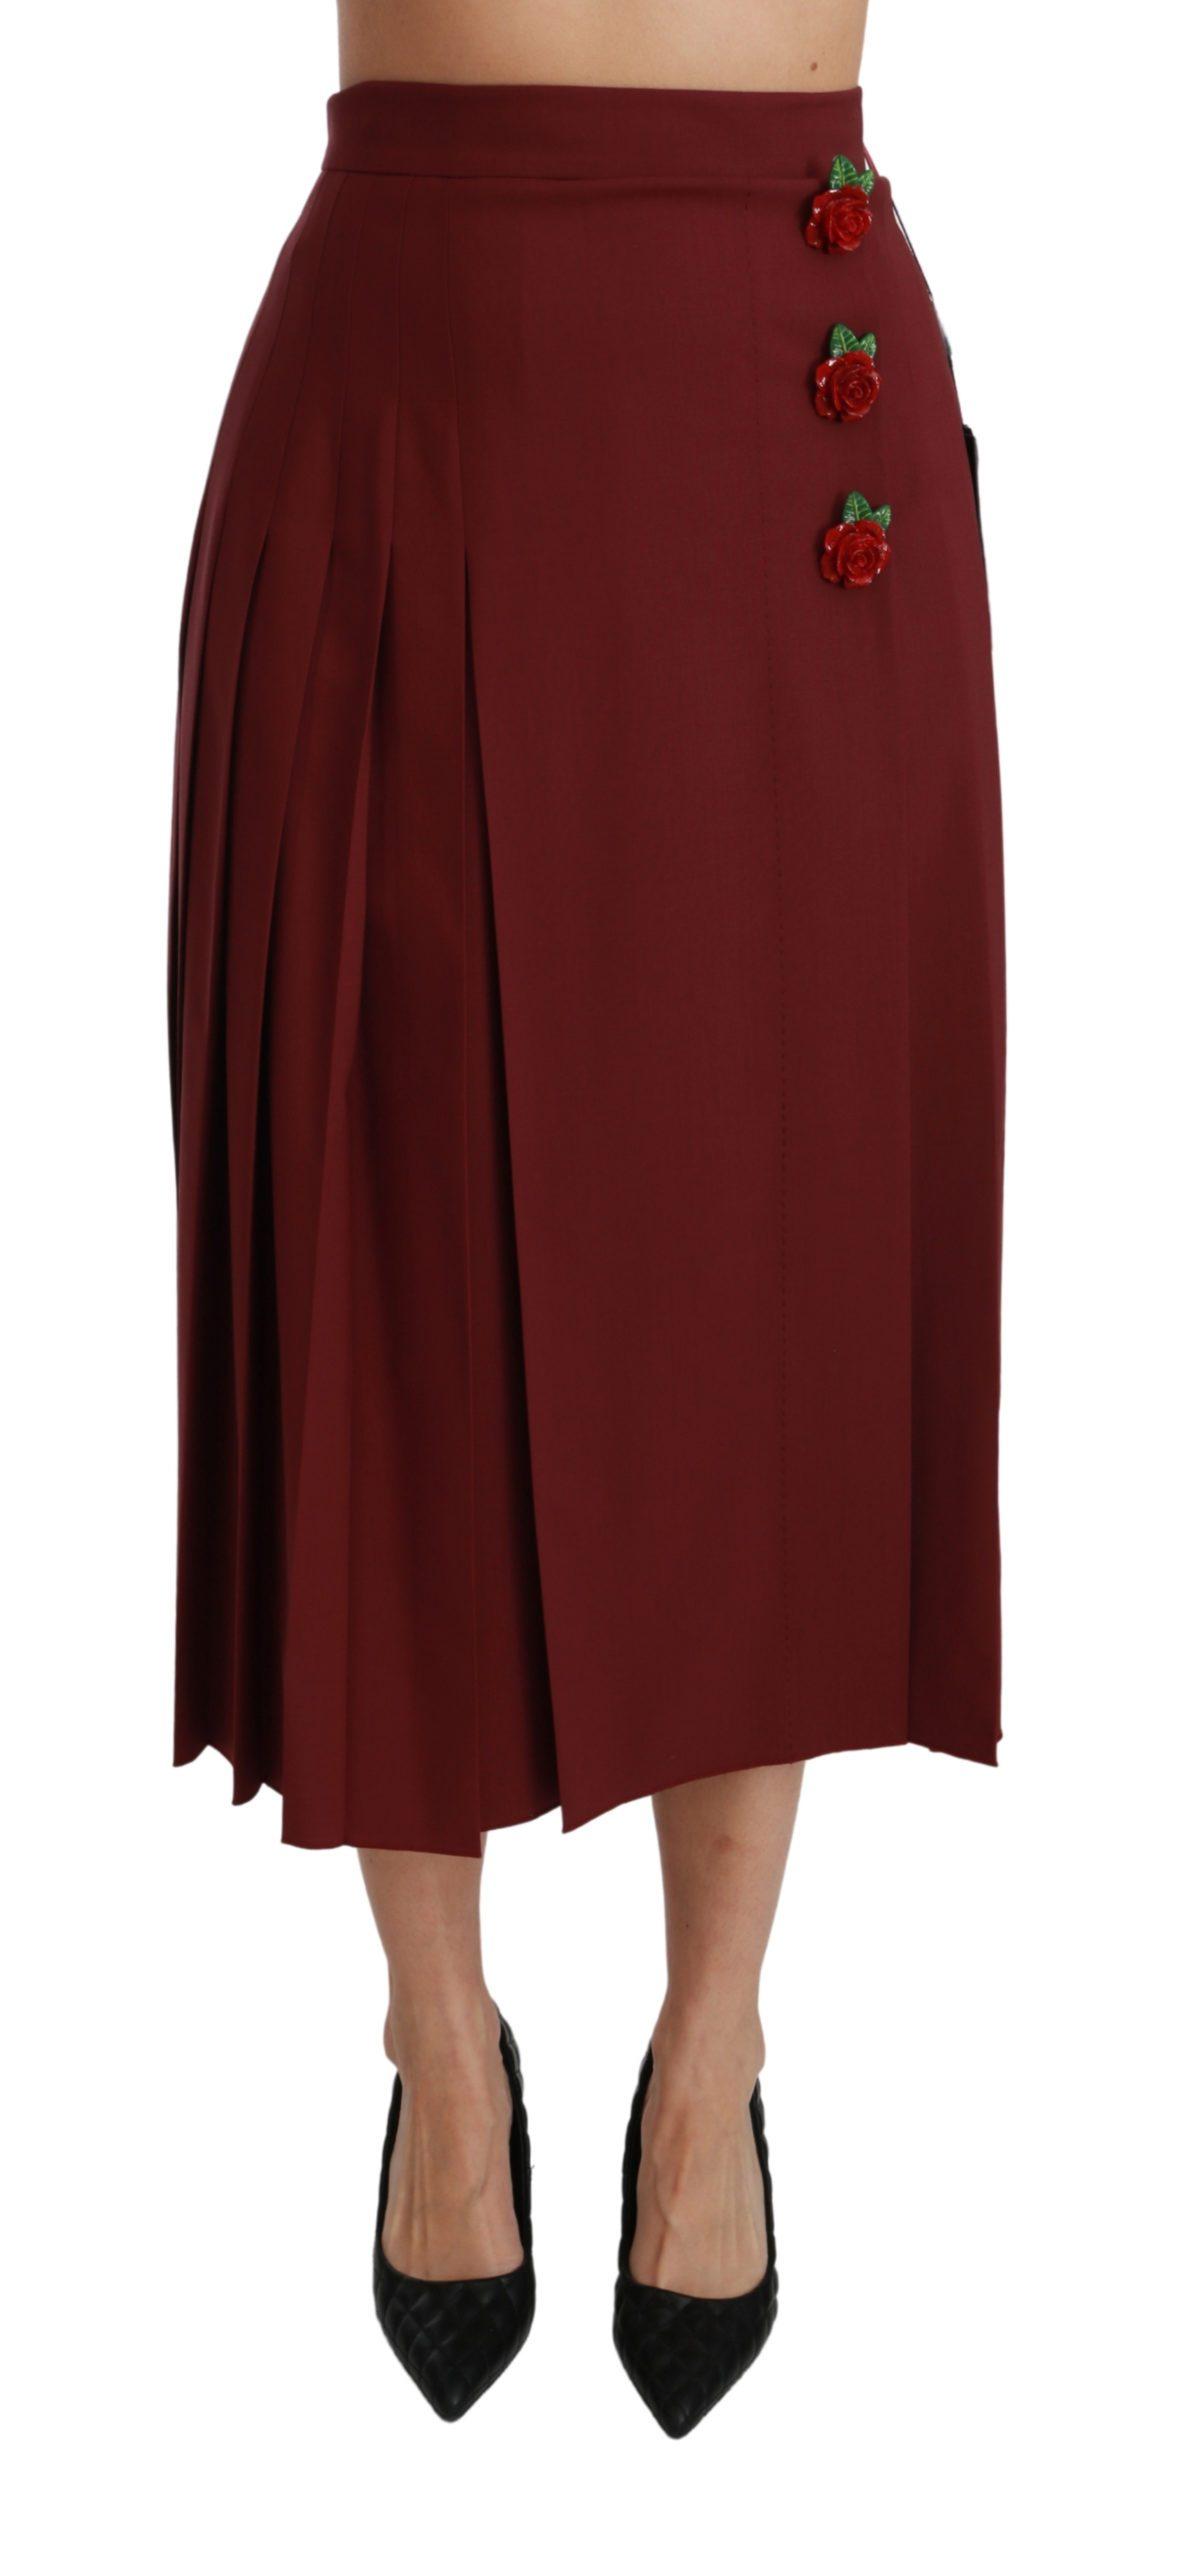 Dolce & Gabbana Women's High Waist Pleated Maxi Wool Skirt Red SKI1416 - IT38 XS